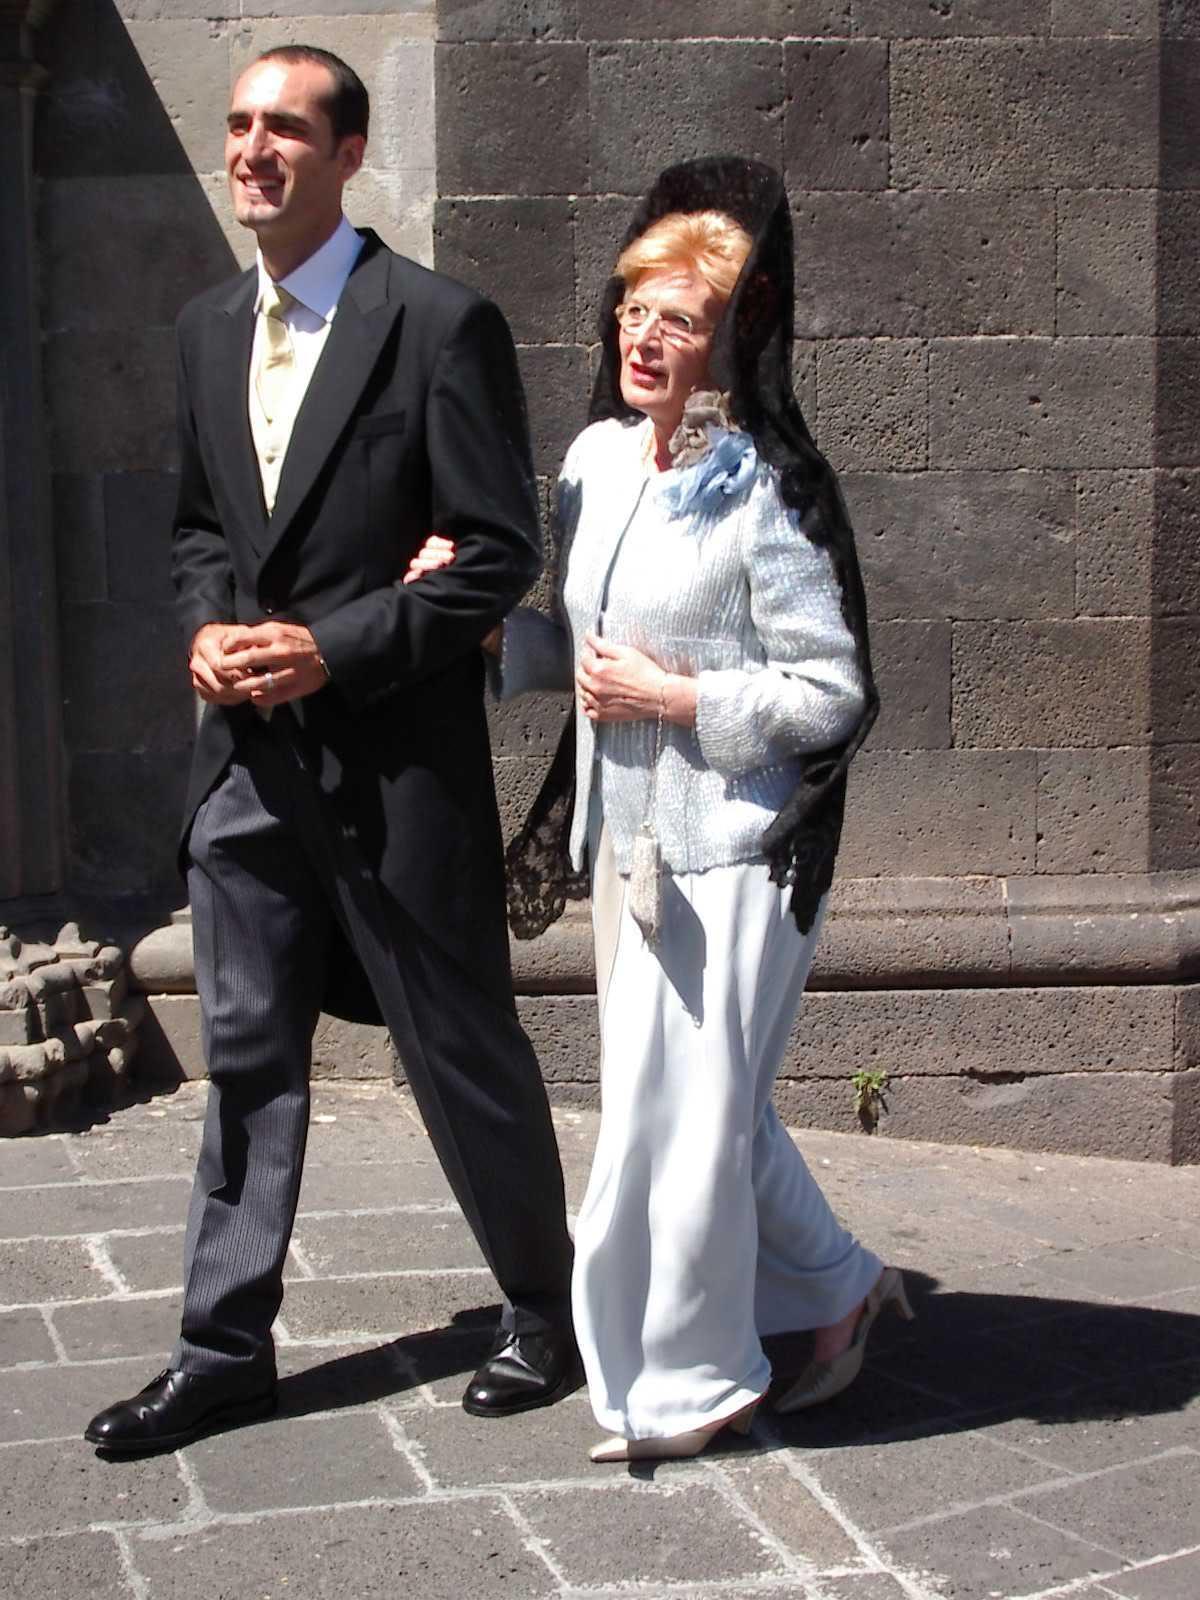 Vestido madrina senora mayor